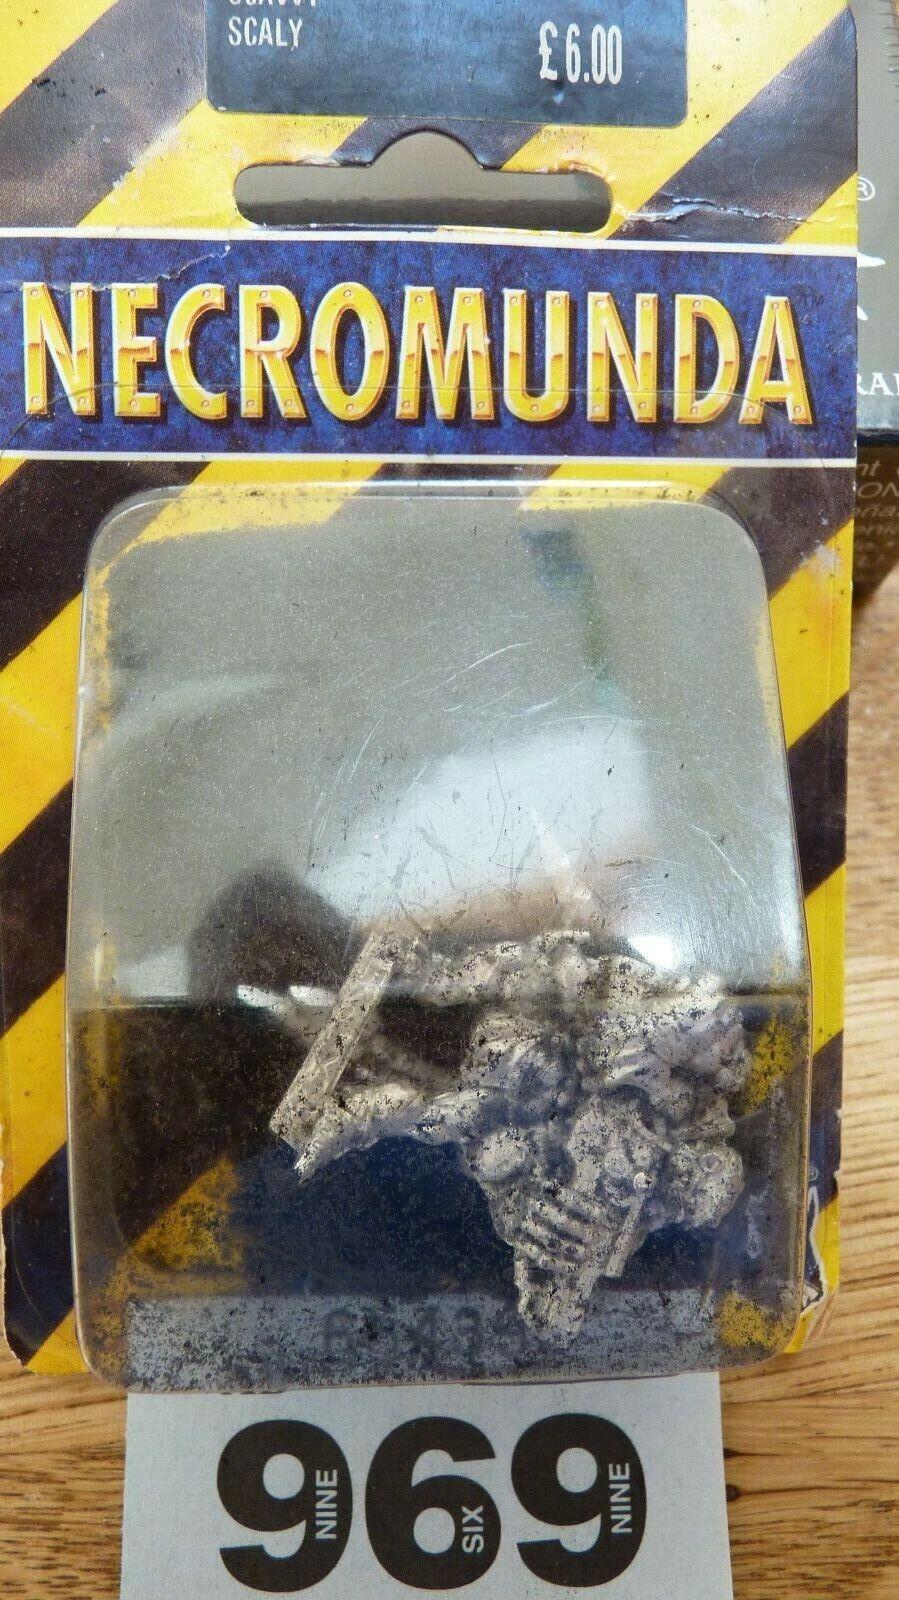 WARHAMMER SPECIALIST GAMES NECROMUNDA SCAVVY SCALY WITH HARPOON GUN MIB OOP